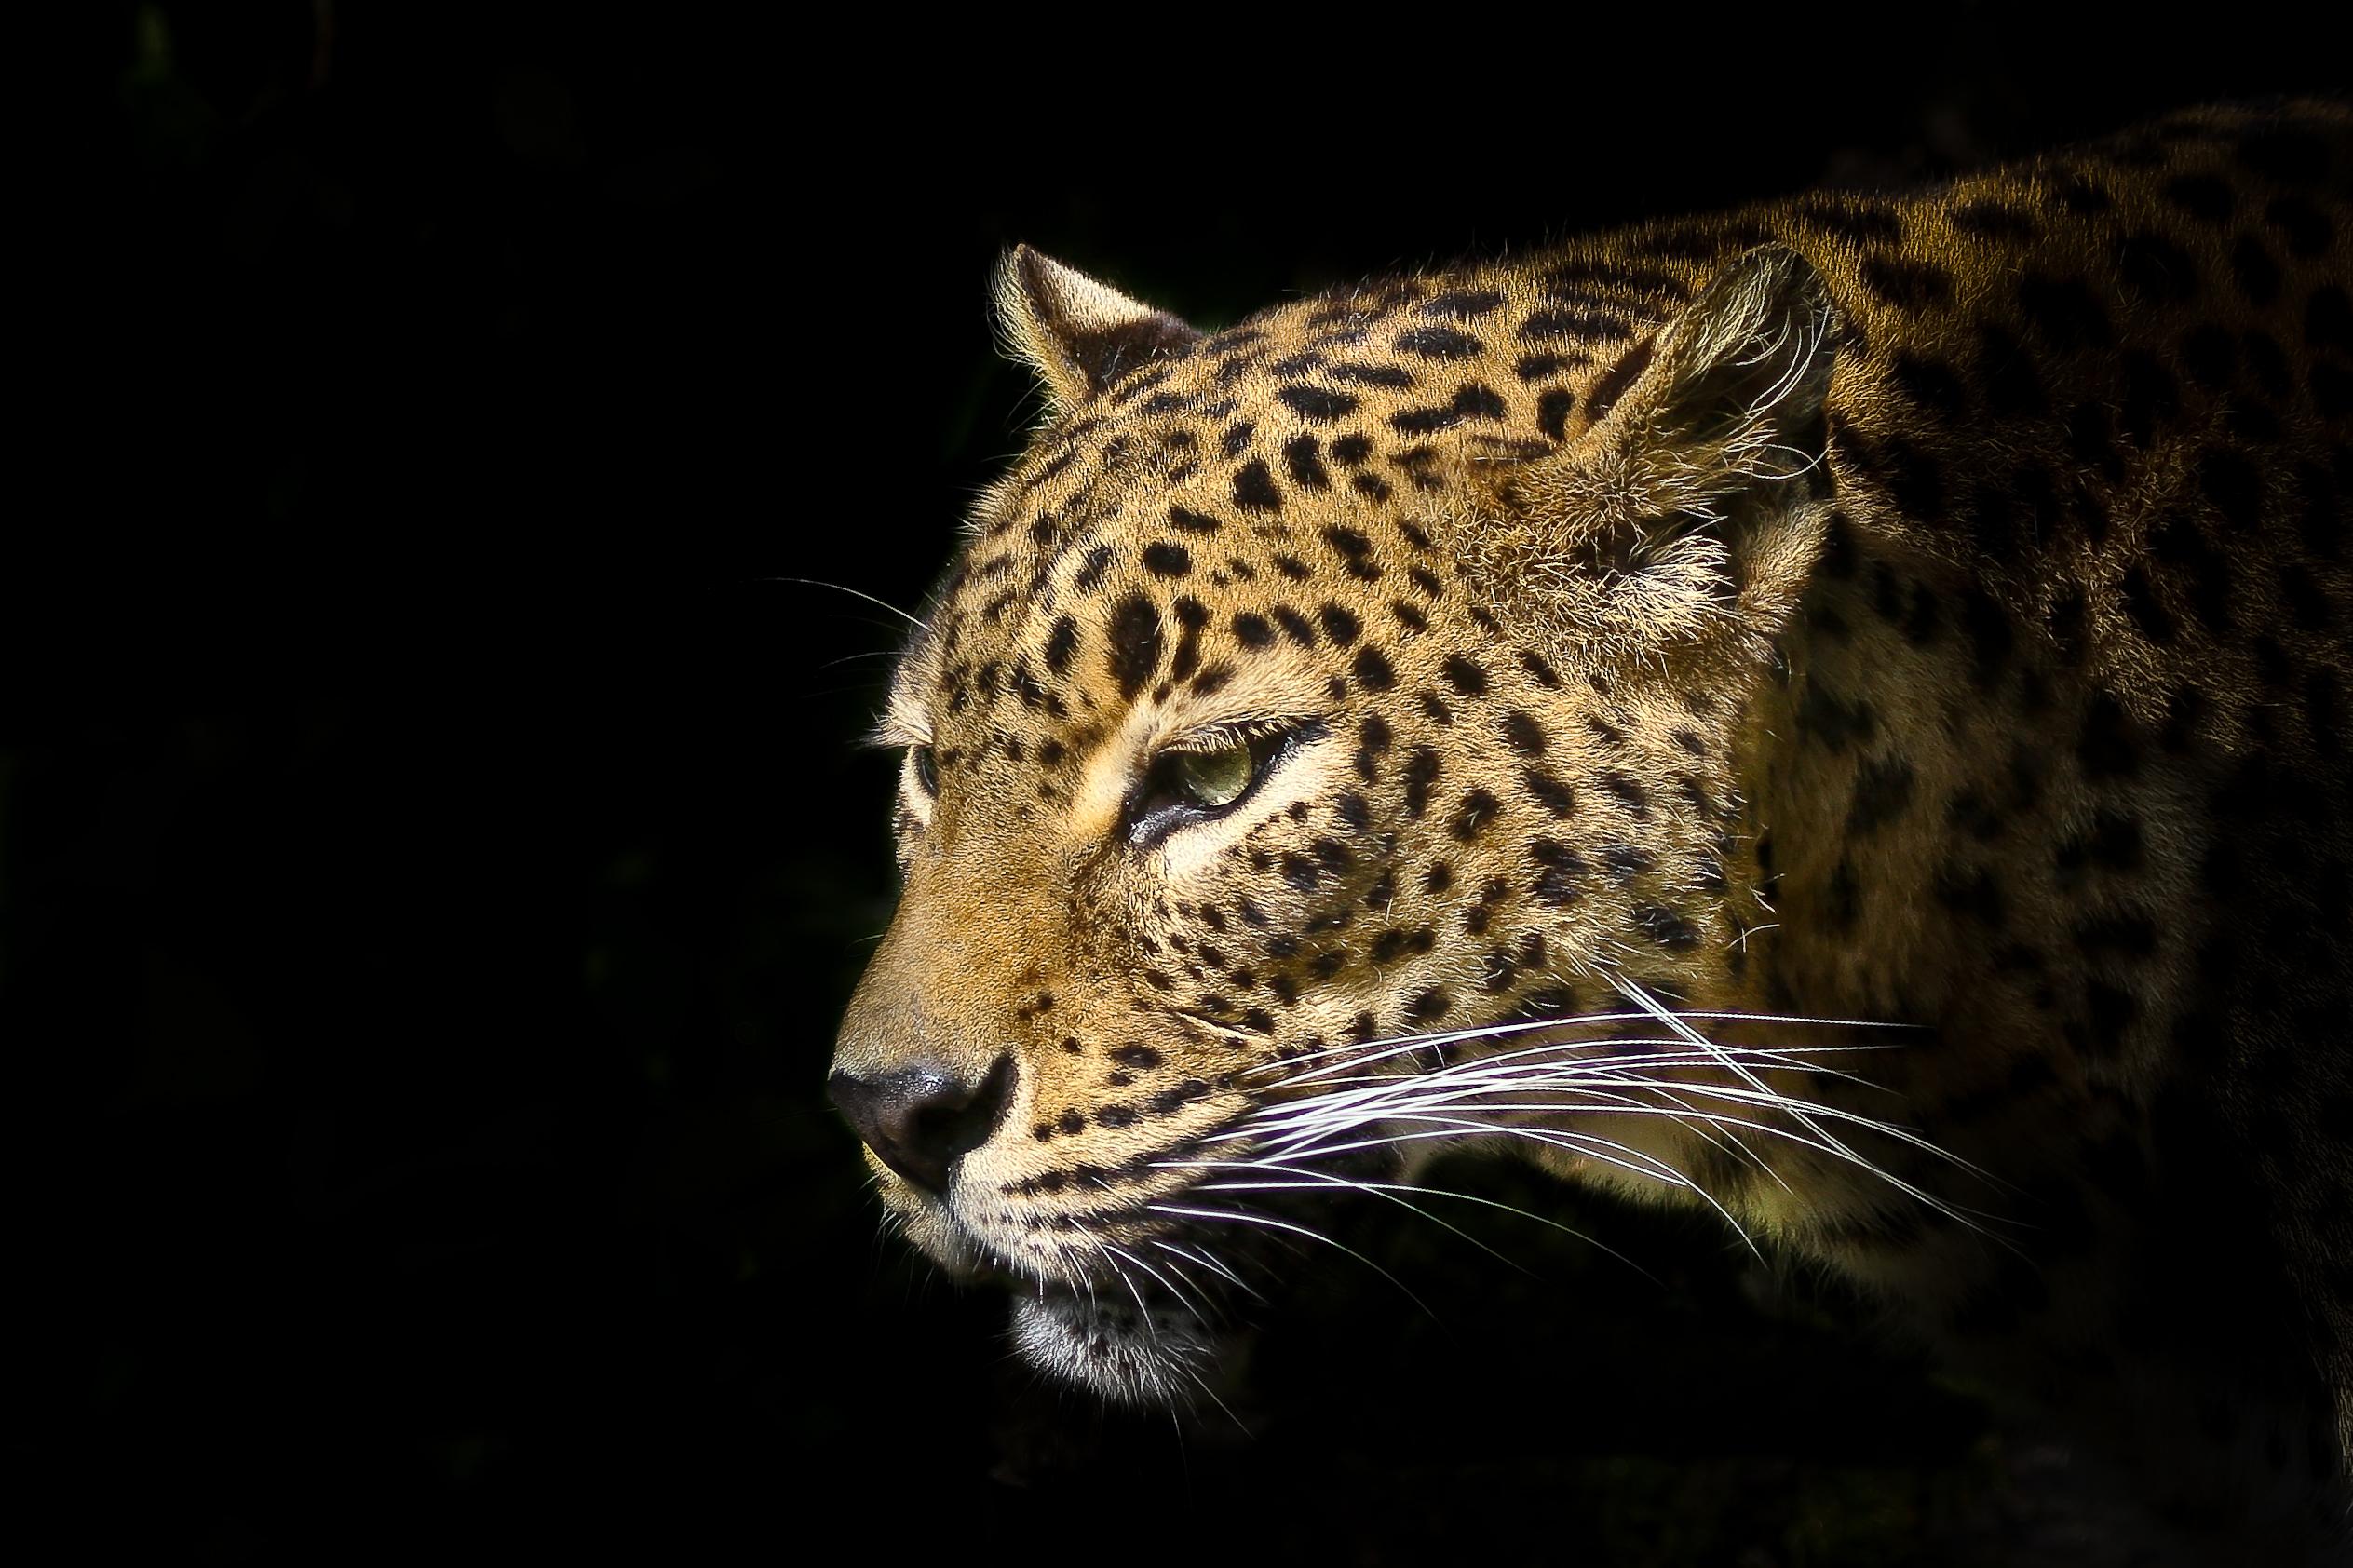 леопард, хищник, животное